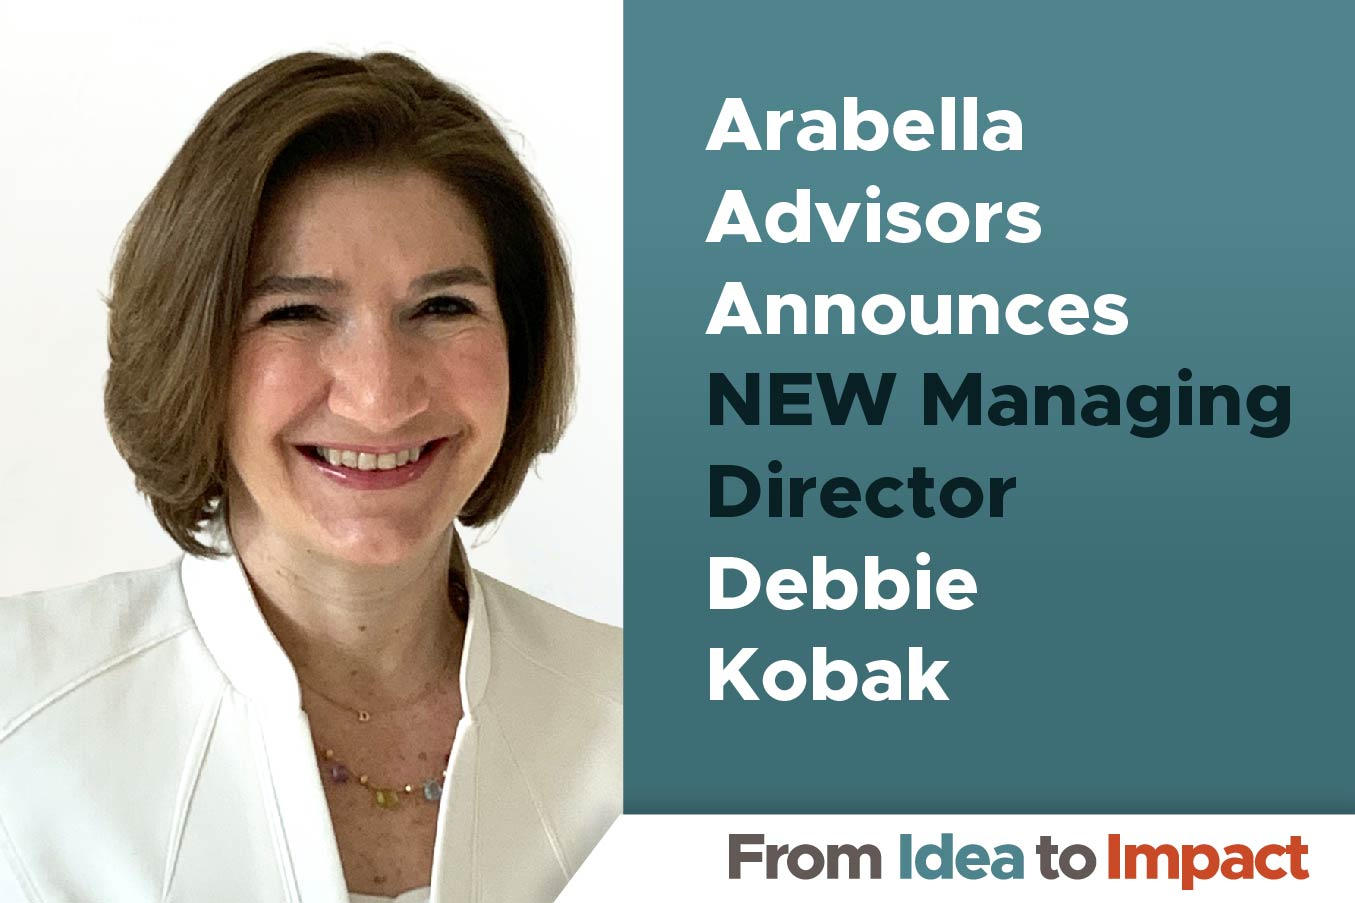 Arabella Advisors Adds Debbie Kobak as New Managing Director in Chicago